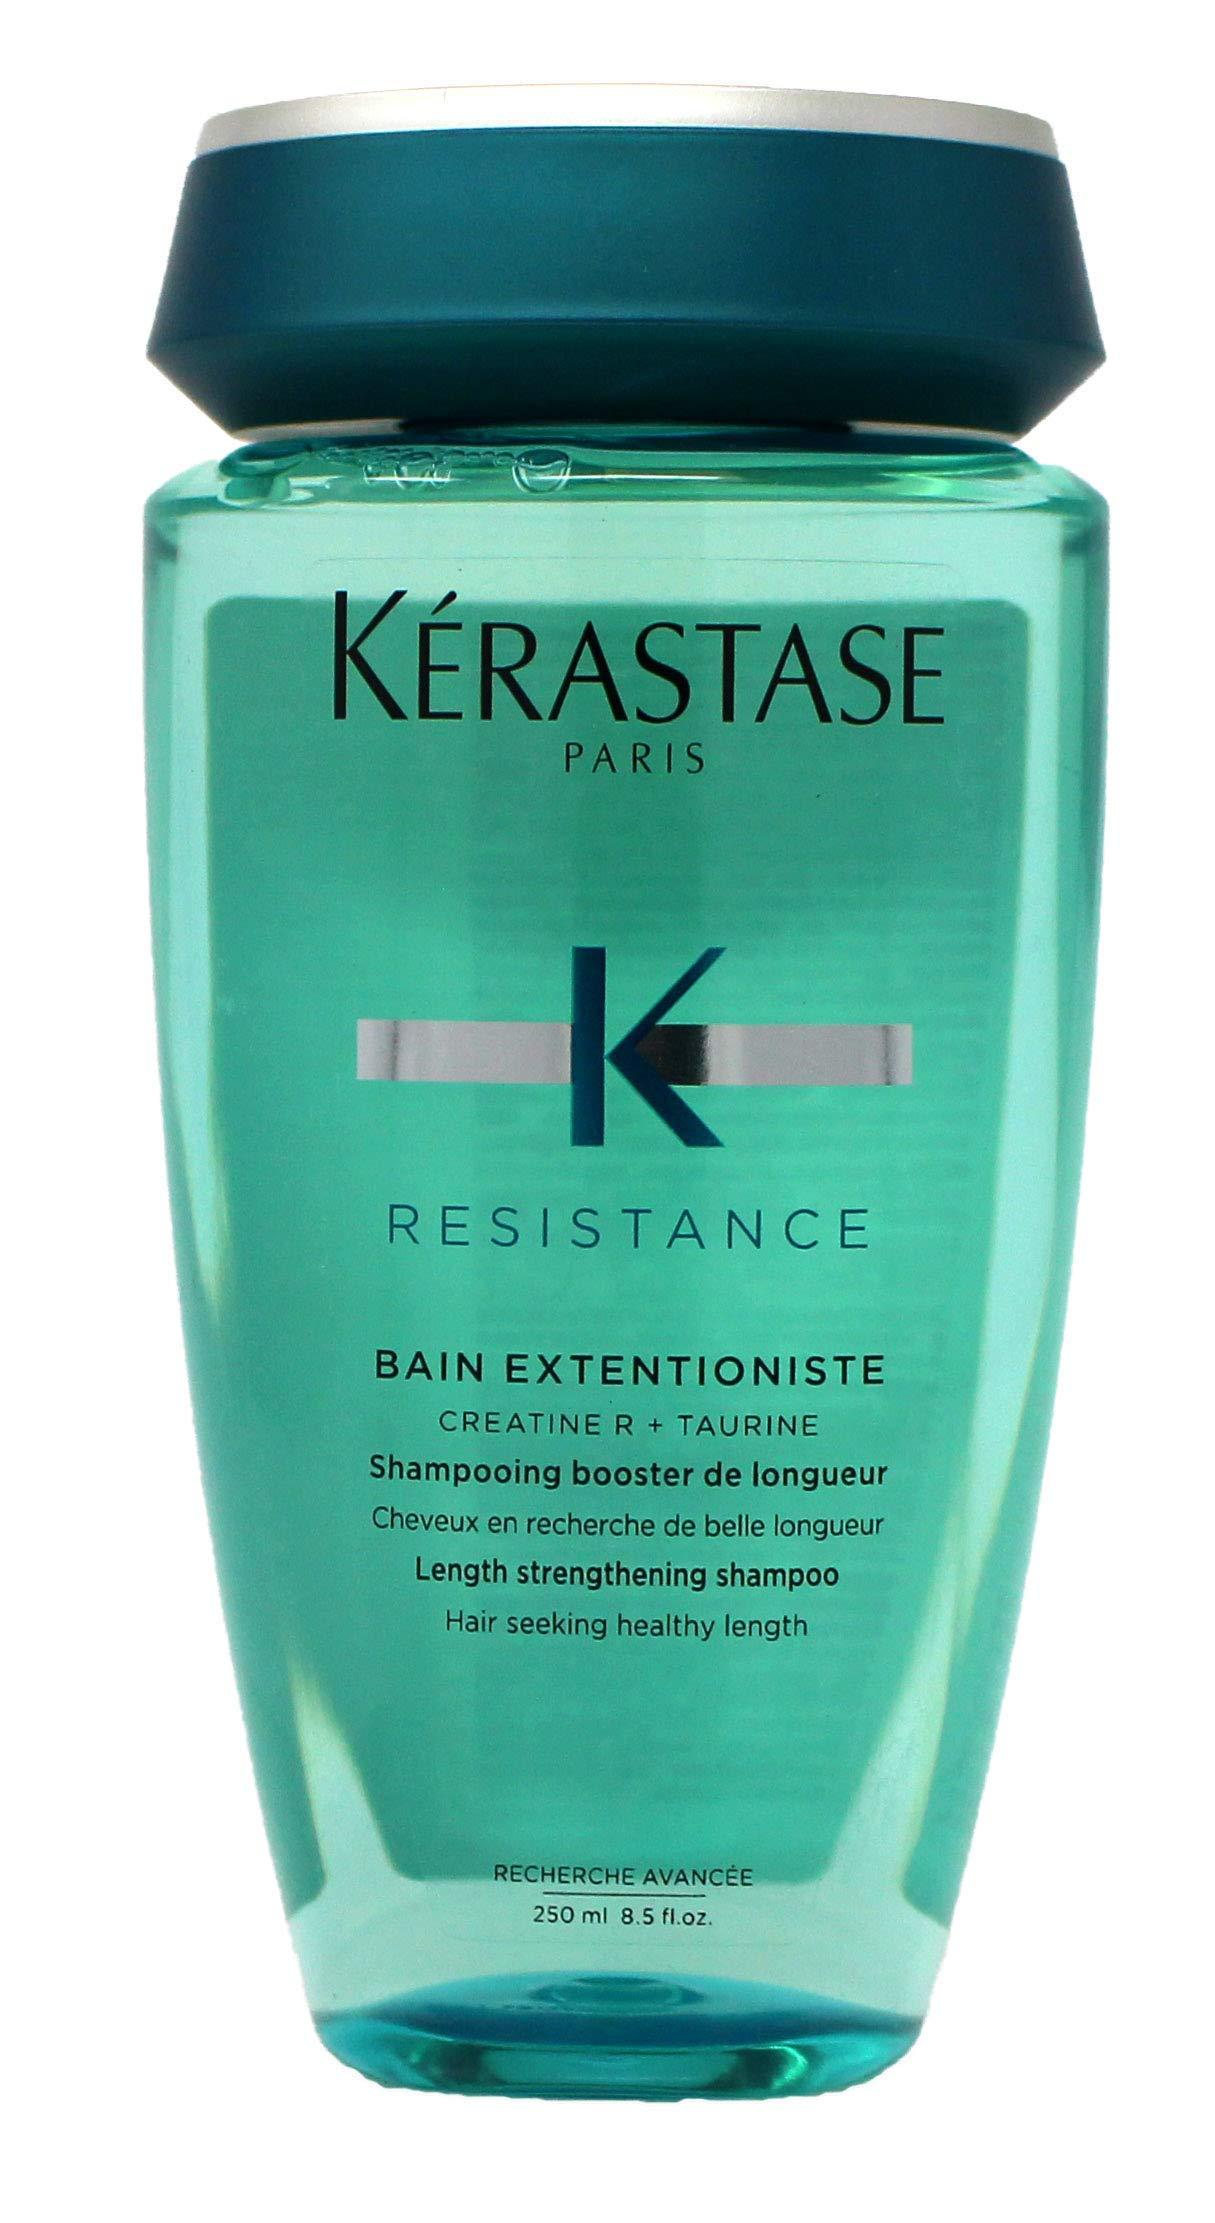 Kerastase Bain Extentioniste, Lenght Strengthening Shampoo 8.5 oz